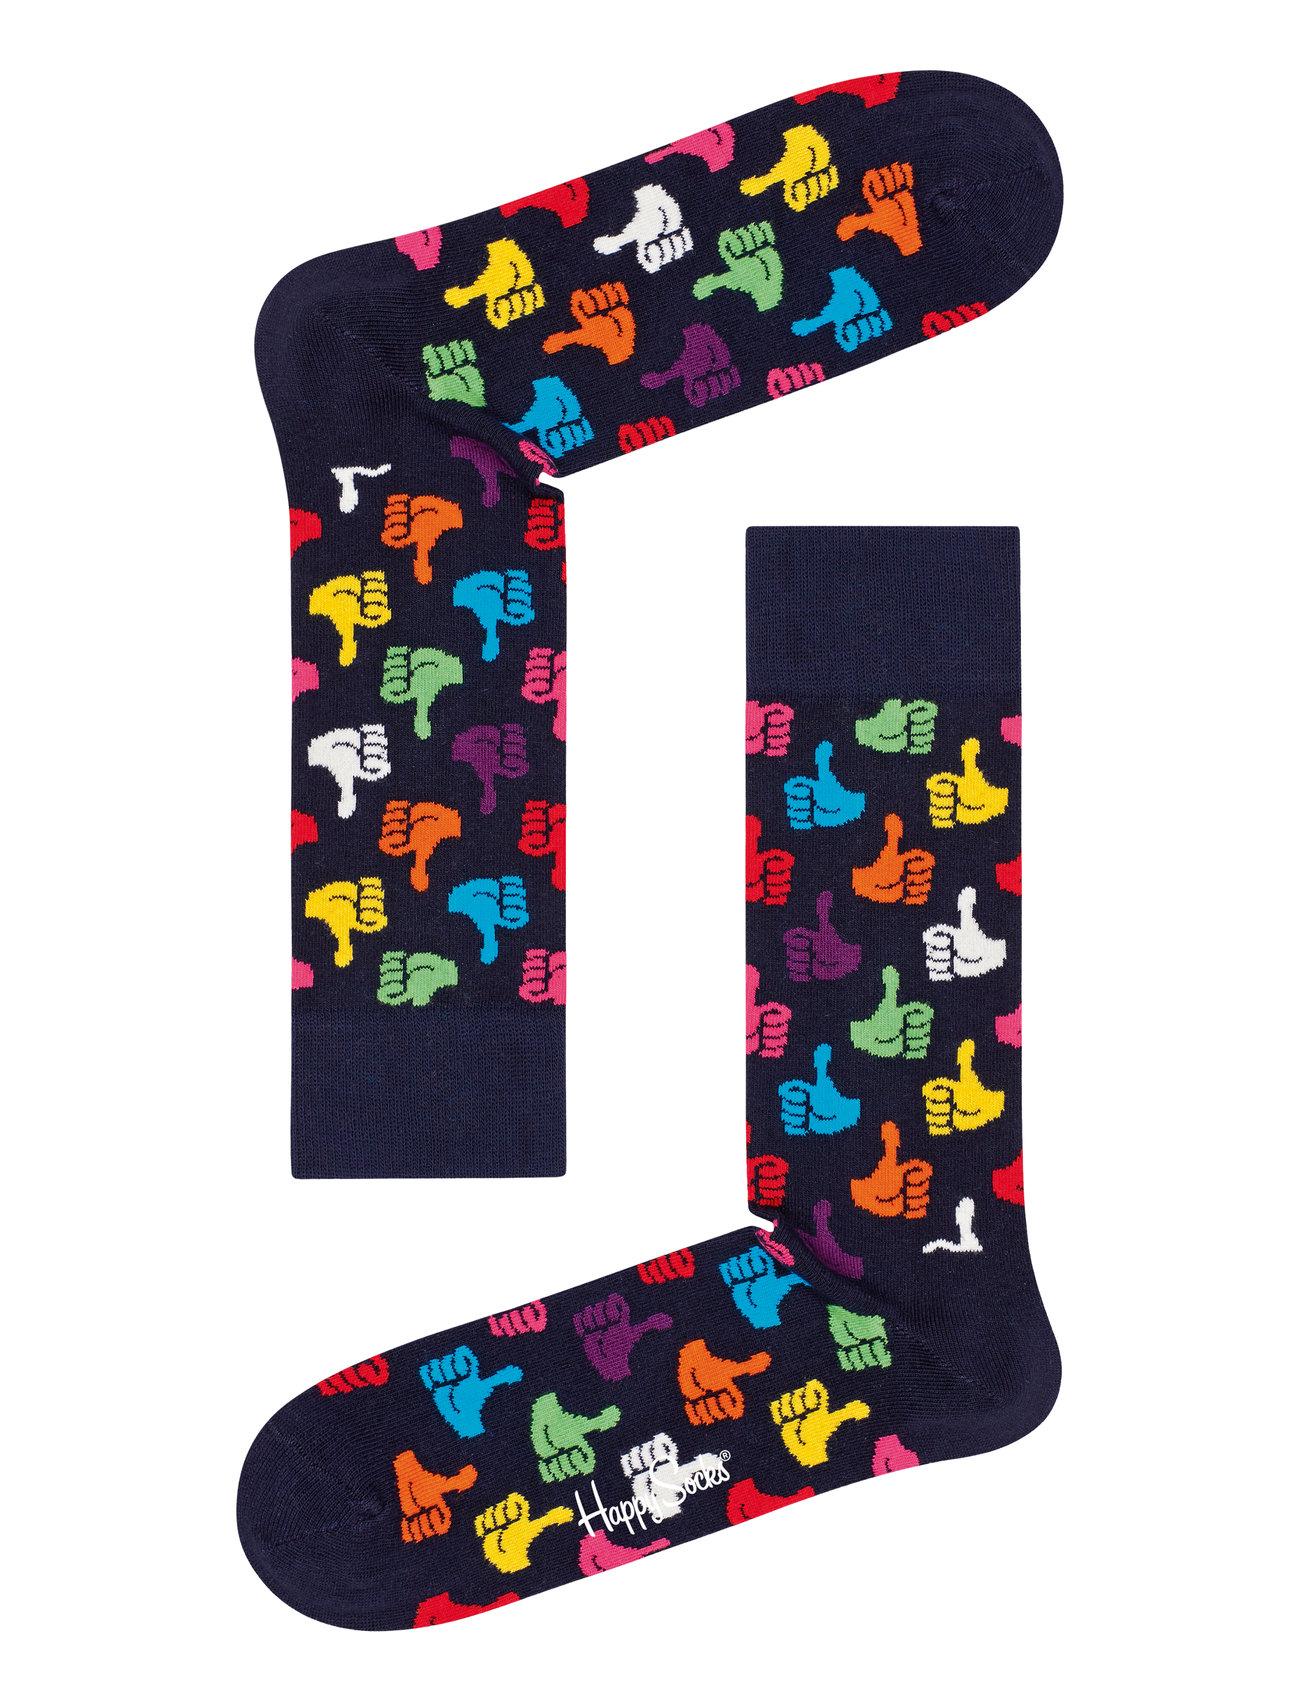 Happy Socks Thumbs Up Sock - BLUE